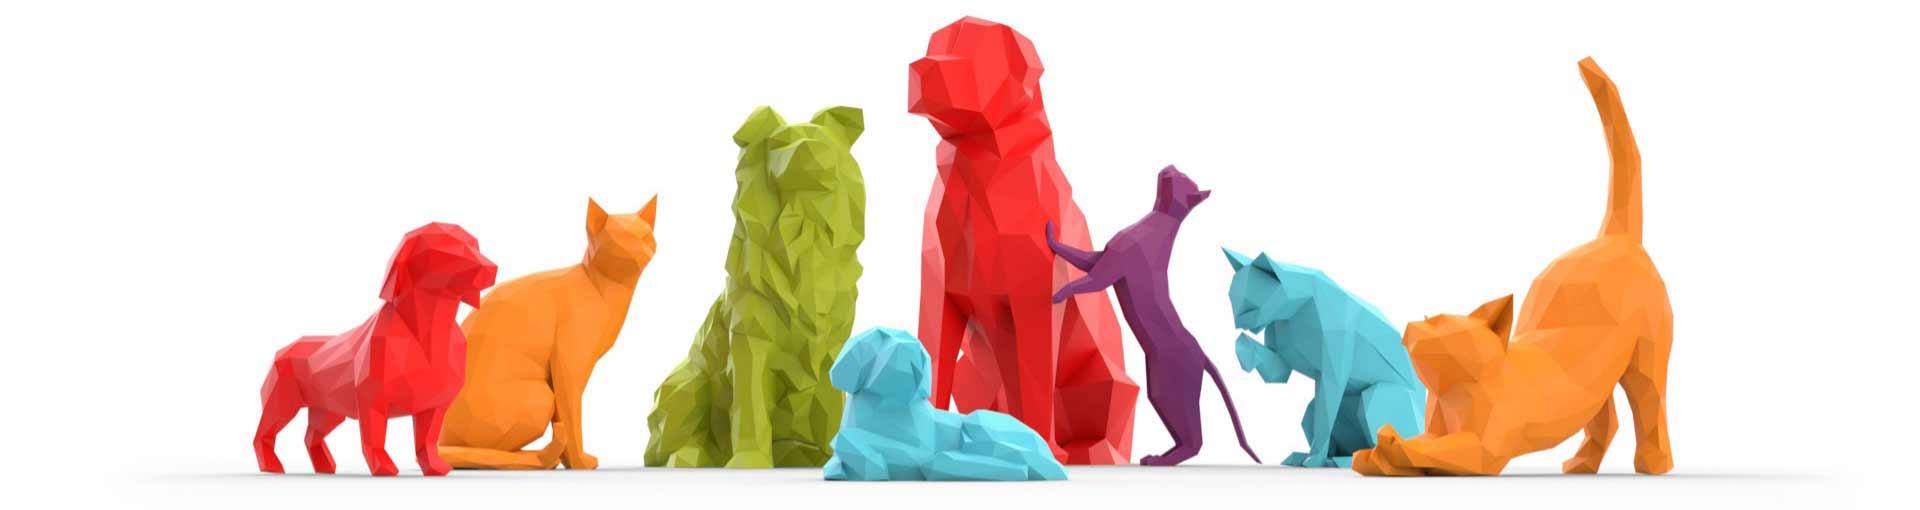 animali decoratovi  uffici Purina